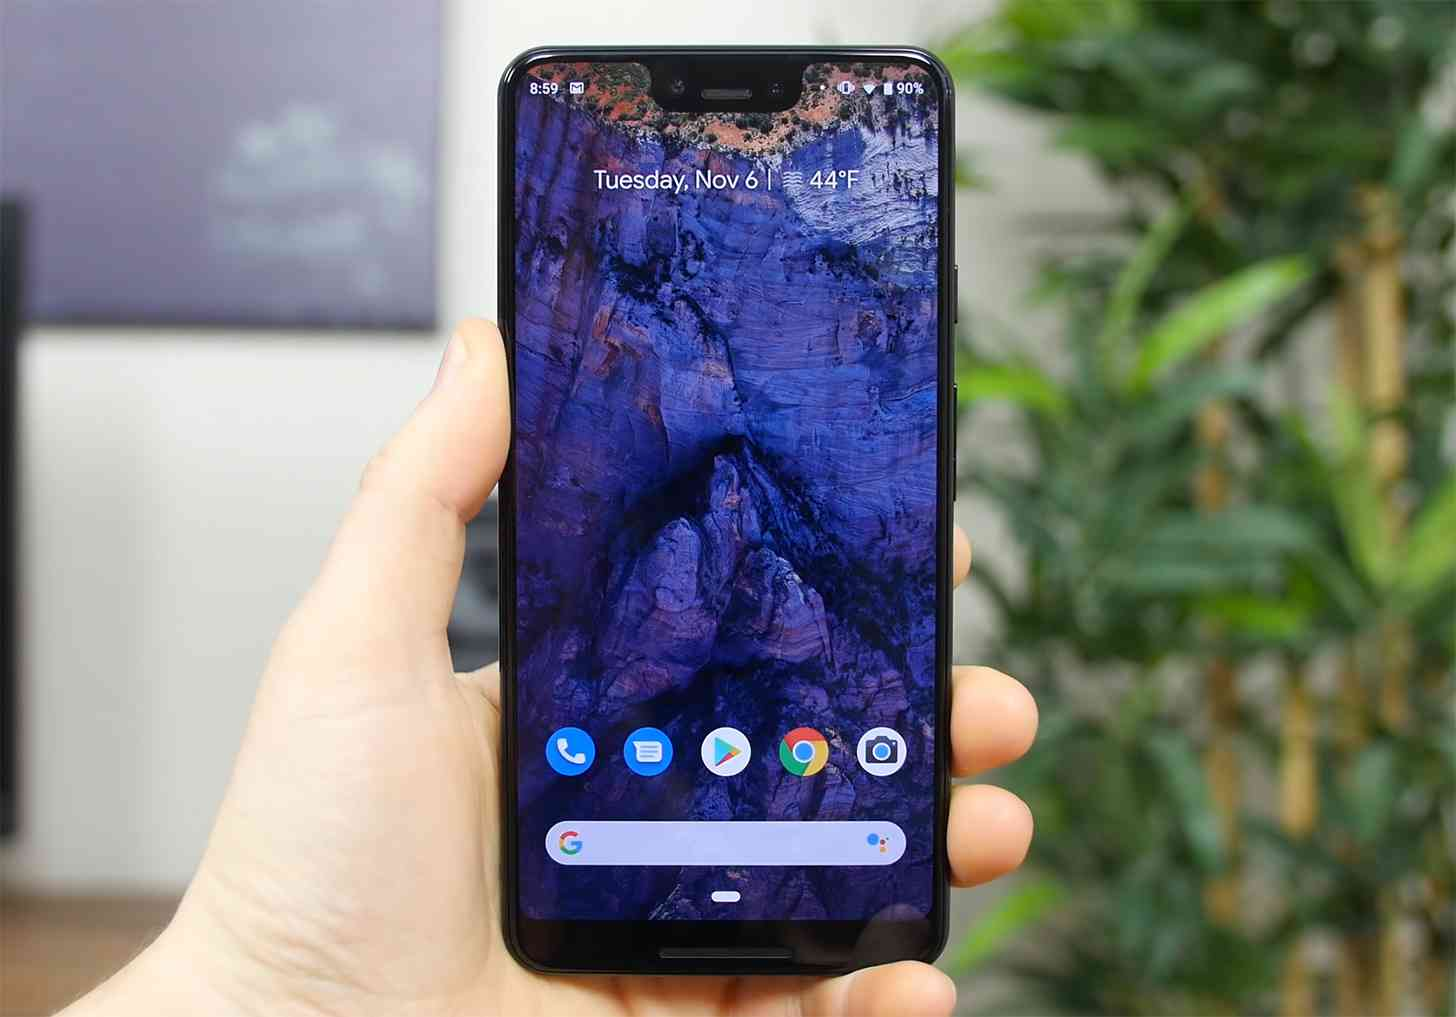 Google Pixel 3 XL hands-on review